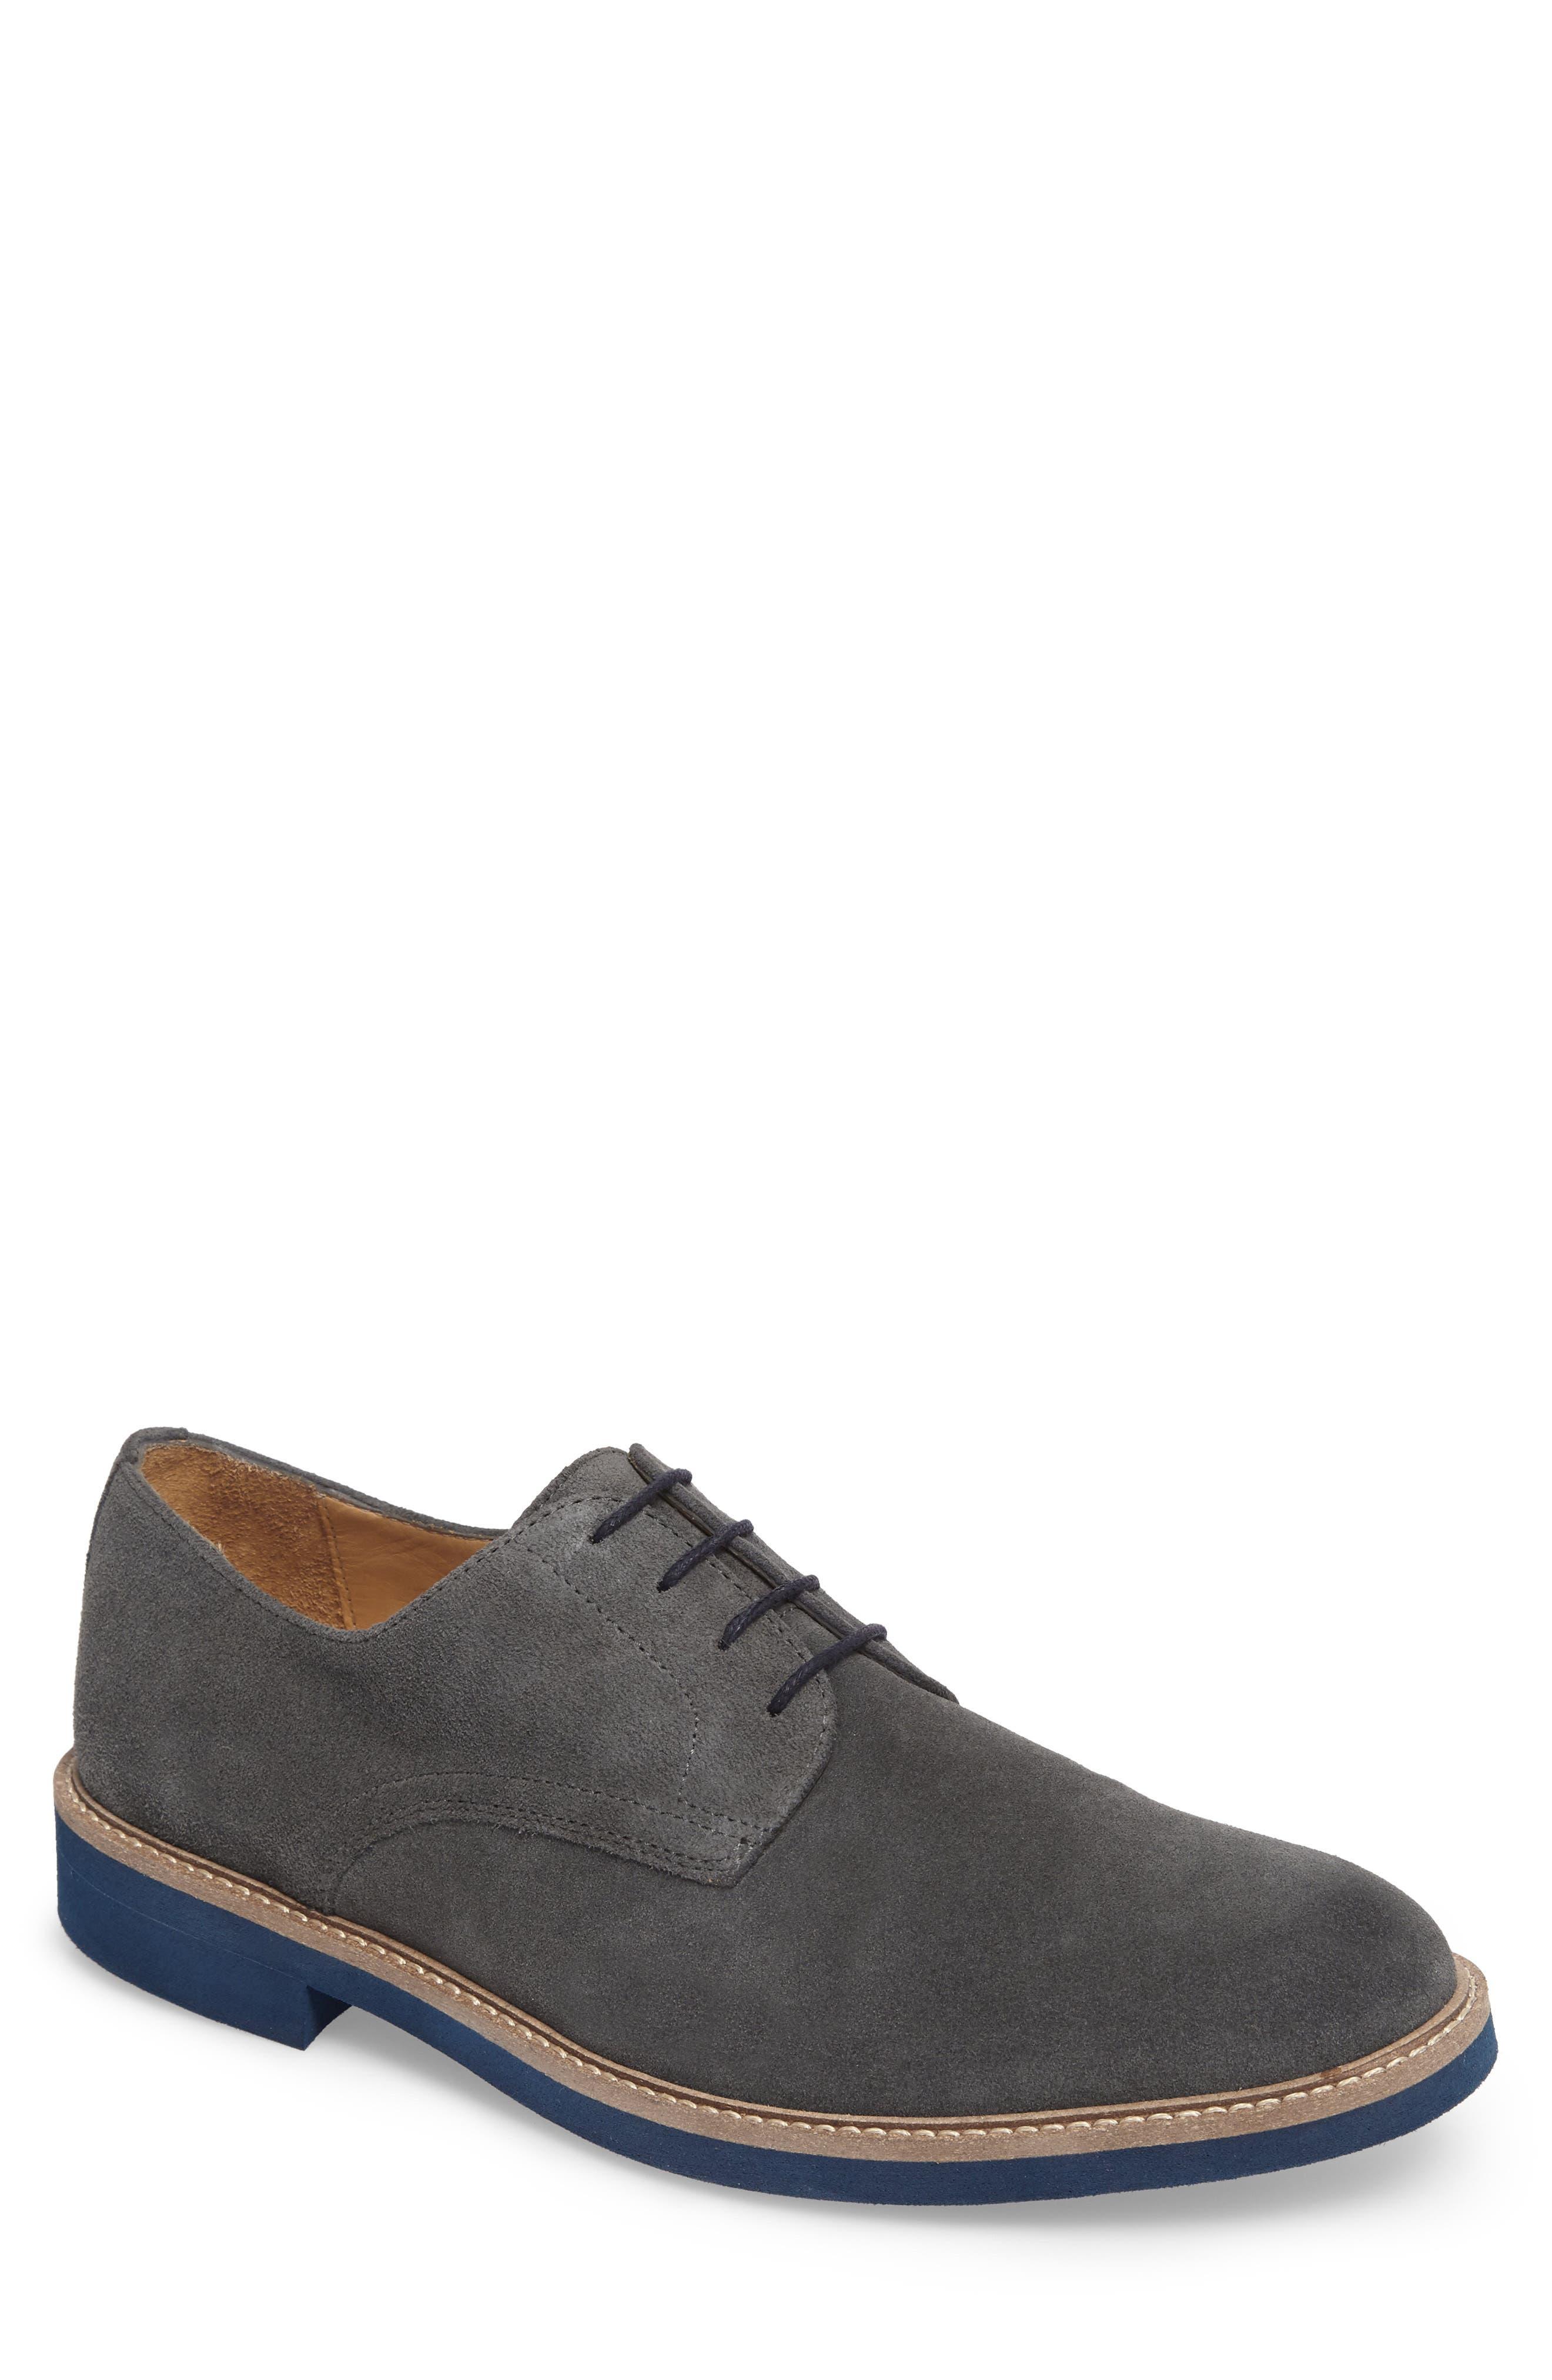 Buck Shoe,                             Main thumbnail 1, color,                             Grey Suede